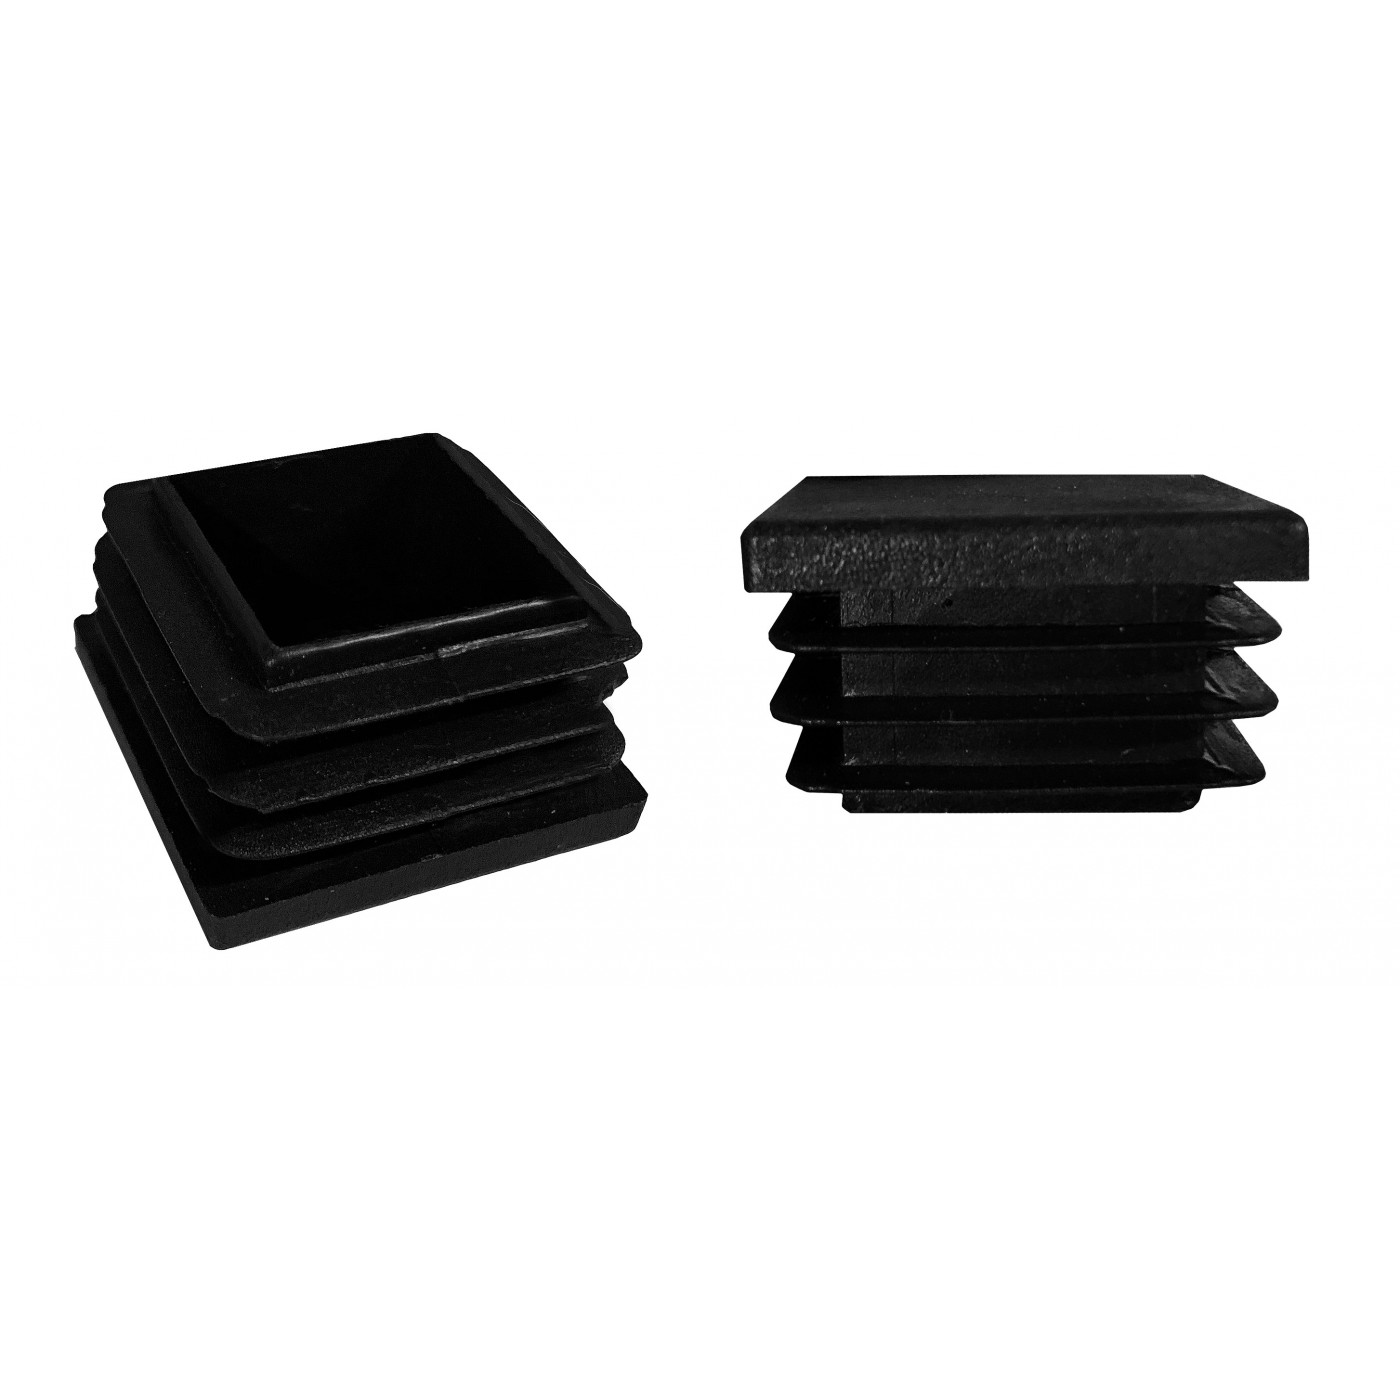 Set of 50 chair leg caps (F13/E18/D19, black)